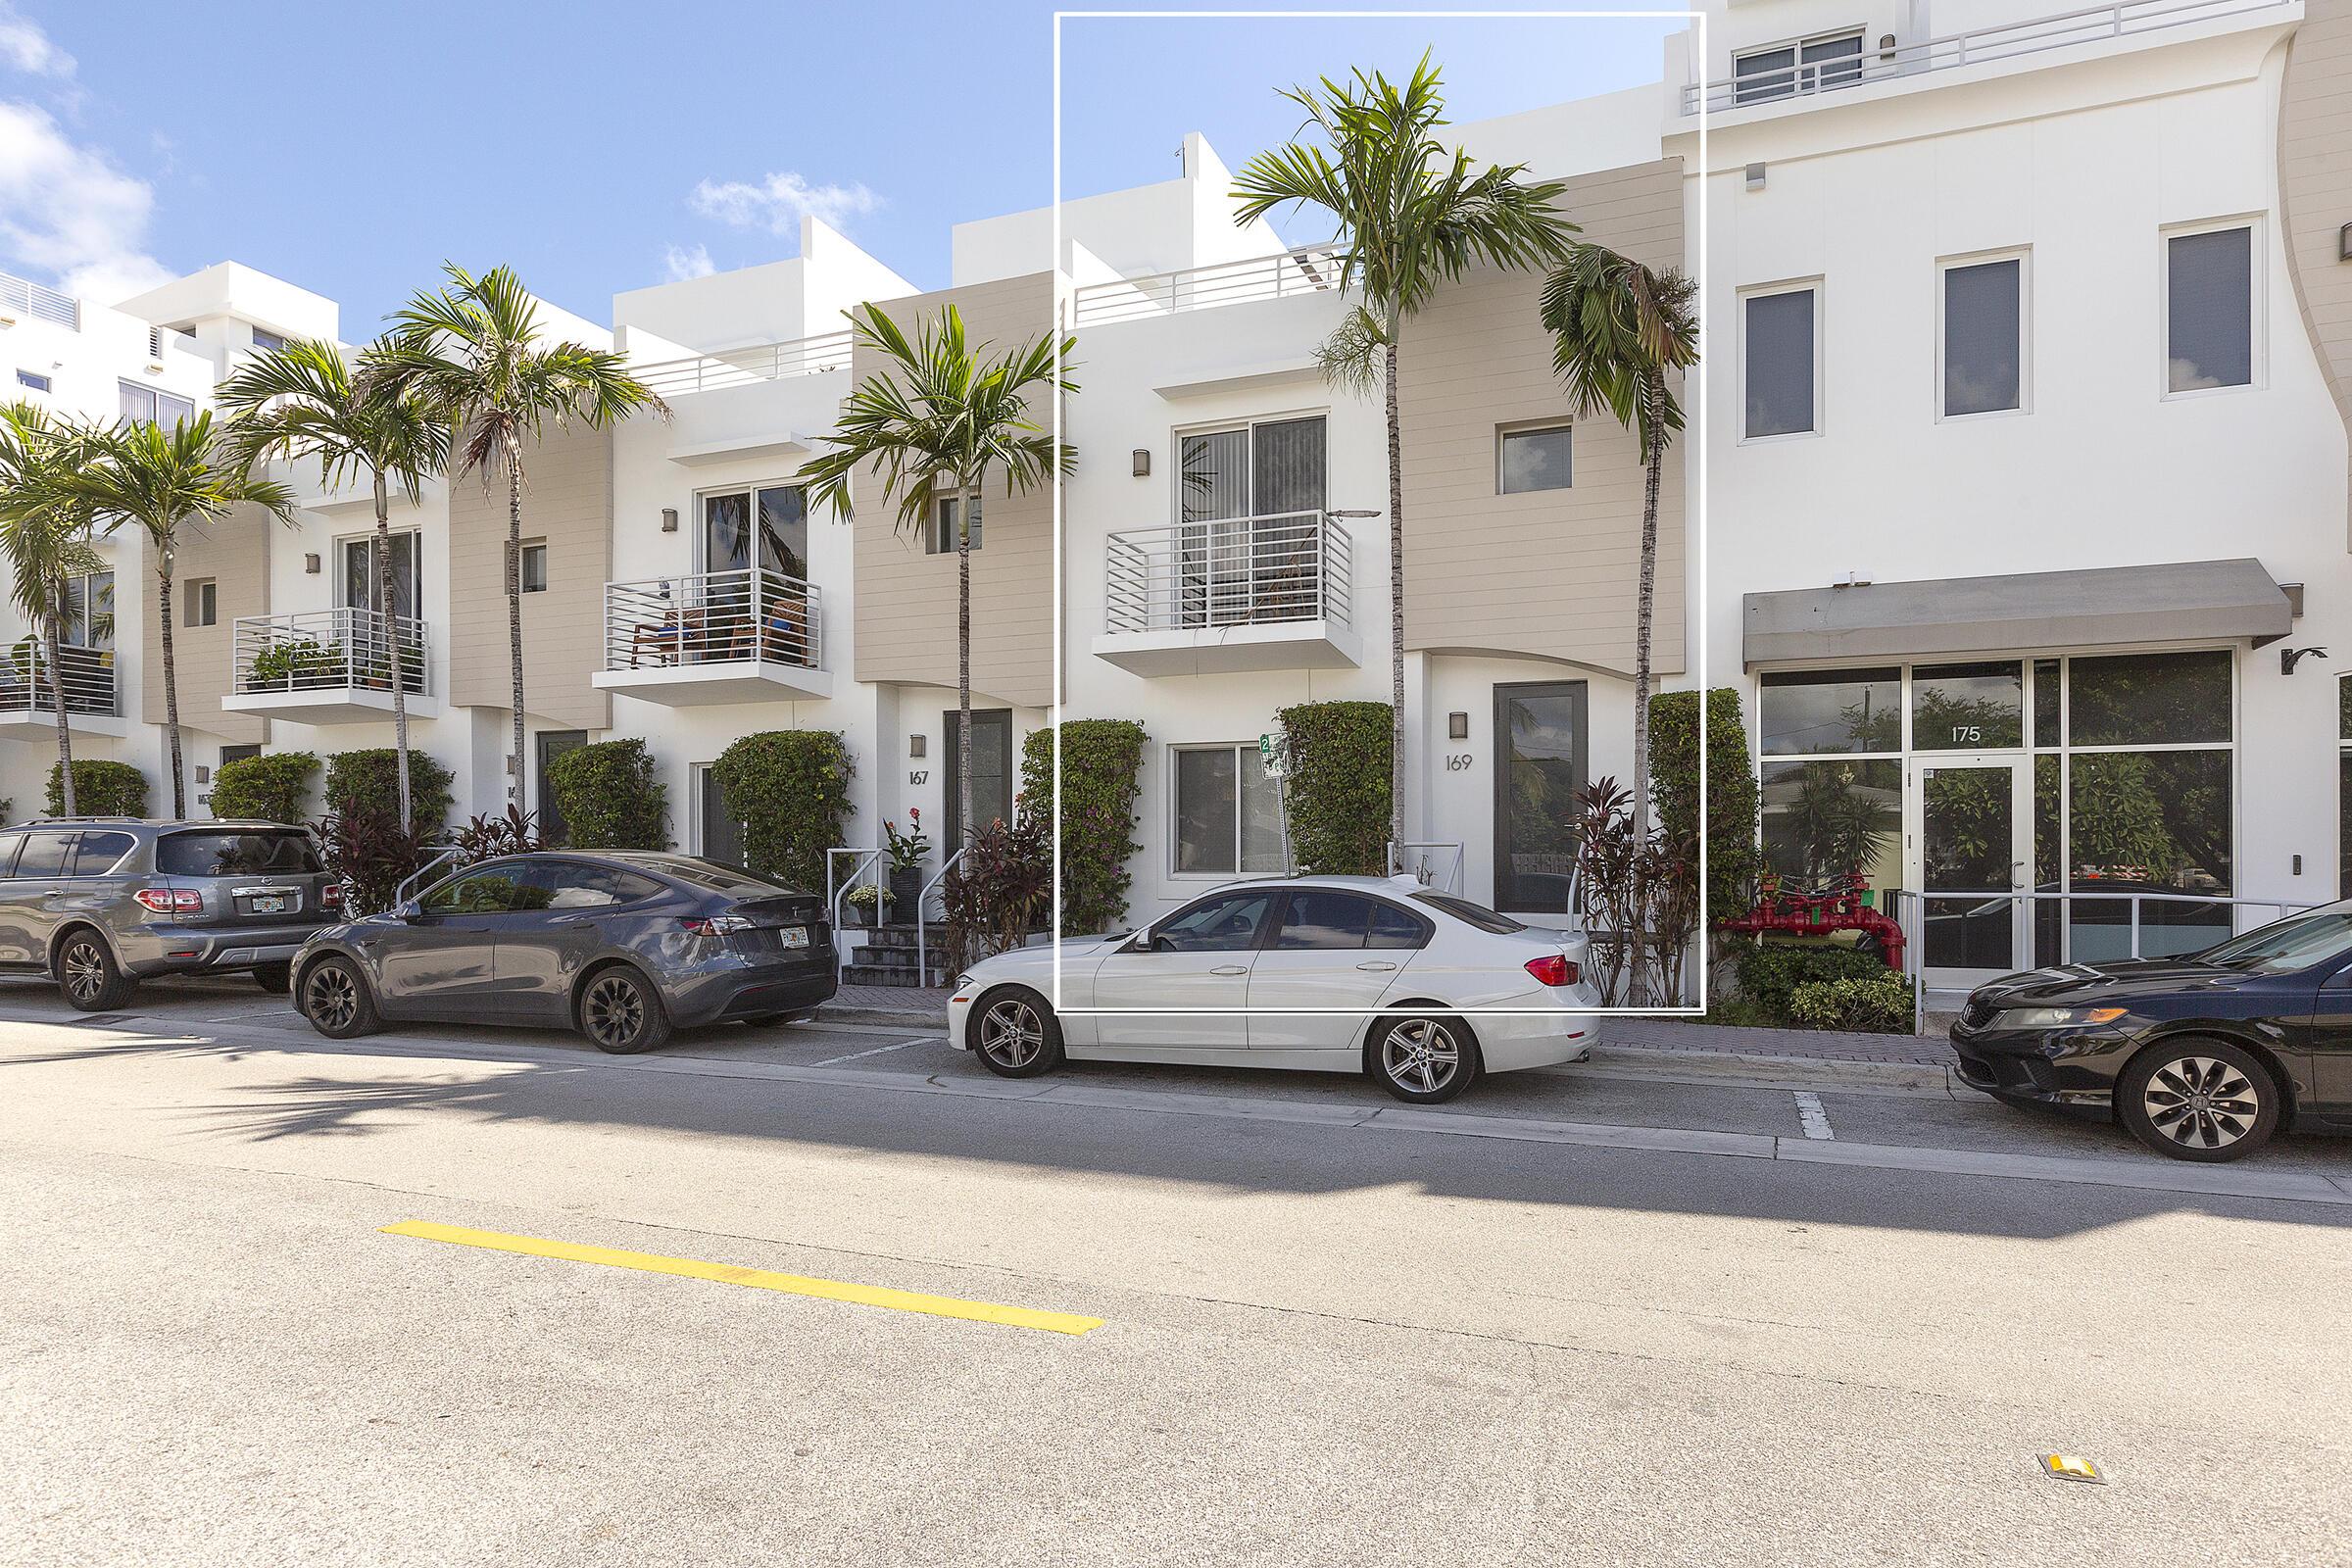 111 2 Street, Delray Beach, Florida 33444, 3 Bedrooms Bedrooms, ,3.1 BathroomsBathrooms,Townhouse,For Sale,2,RX-10750161